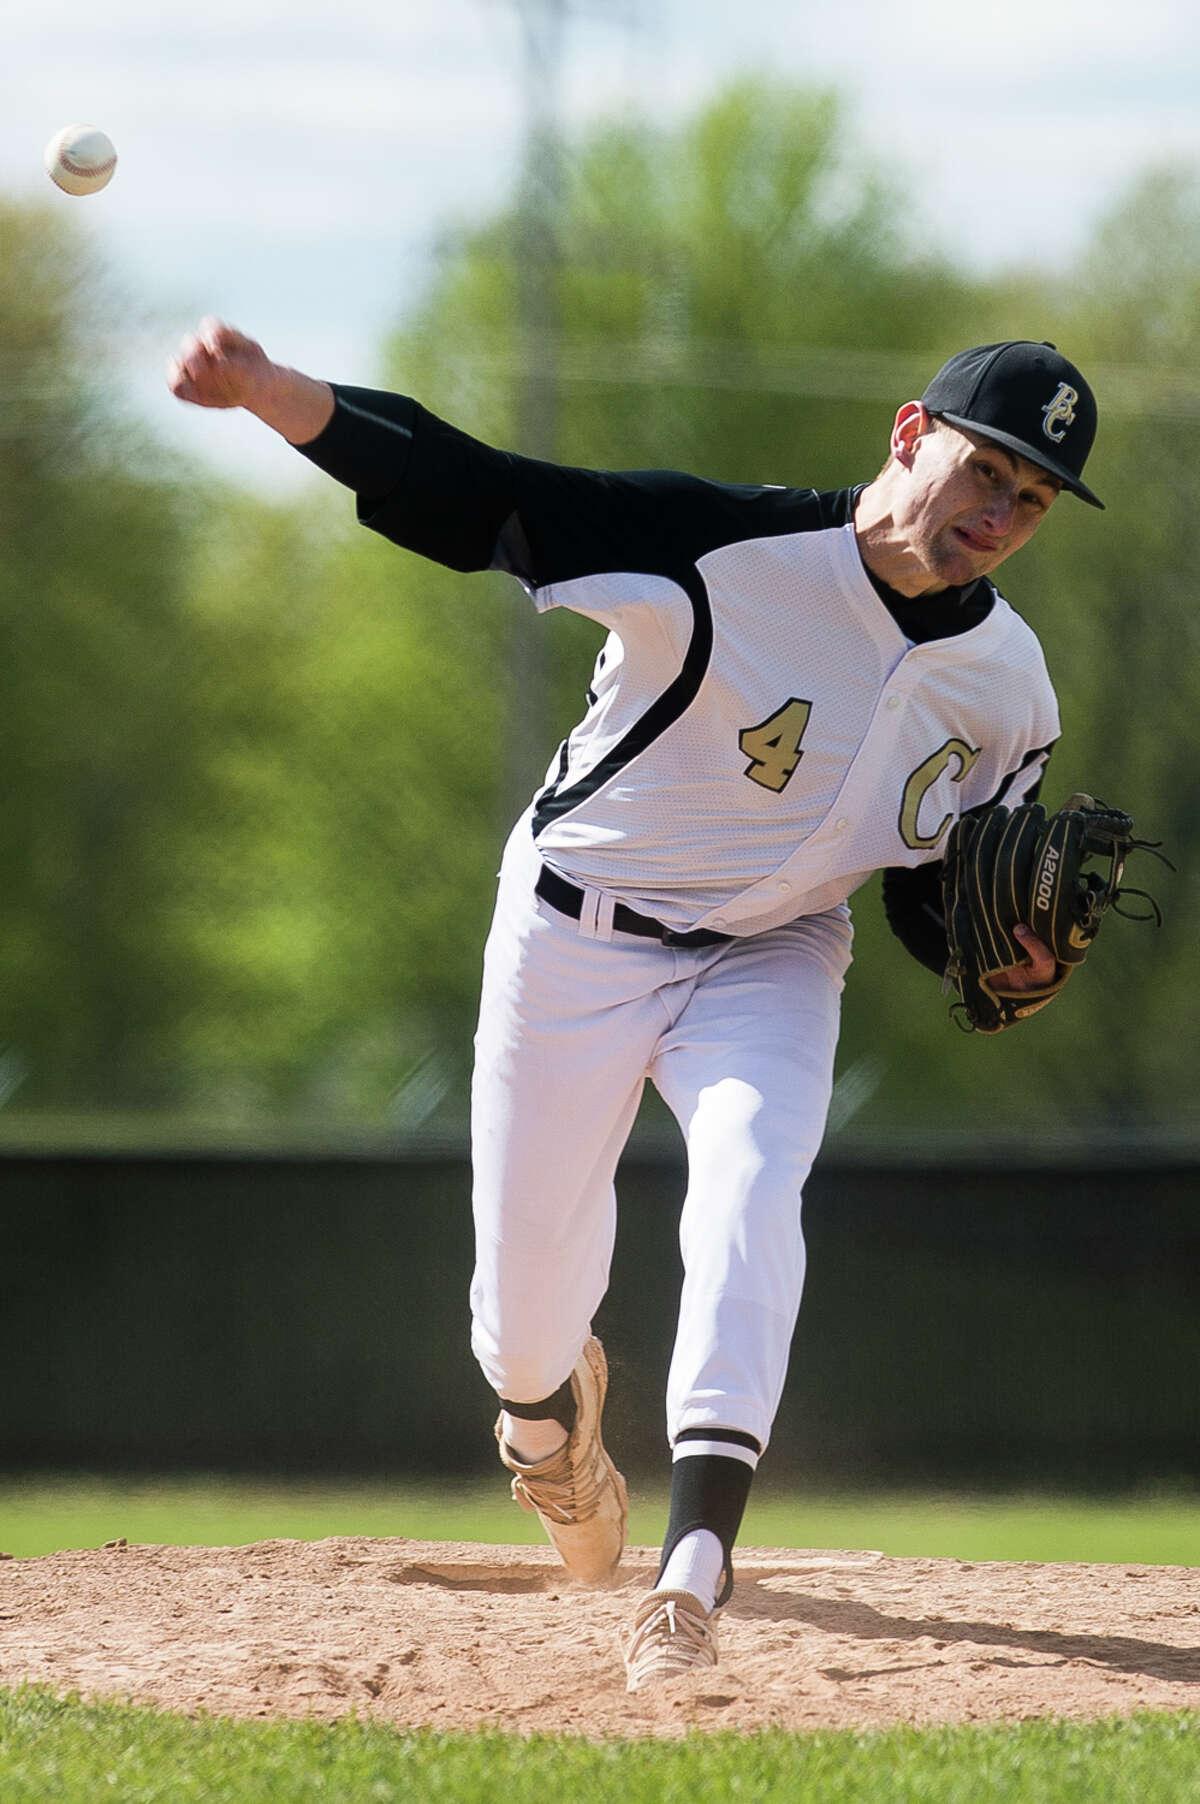 Bullock Creek's Carter Campau pitches the ball during a game against Hemlock Tuesday, May 11, 2021 at Bullock Creek High School. (Katy Kildee/kkildee@mdn.net)